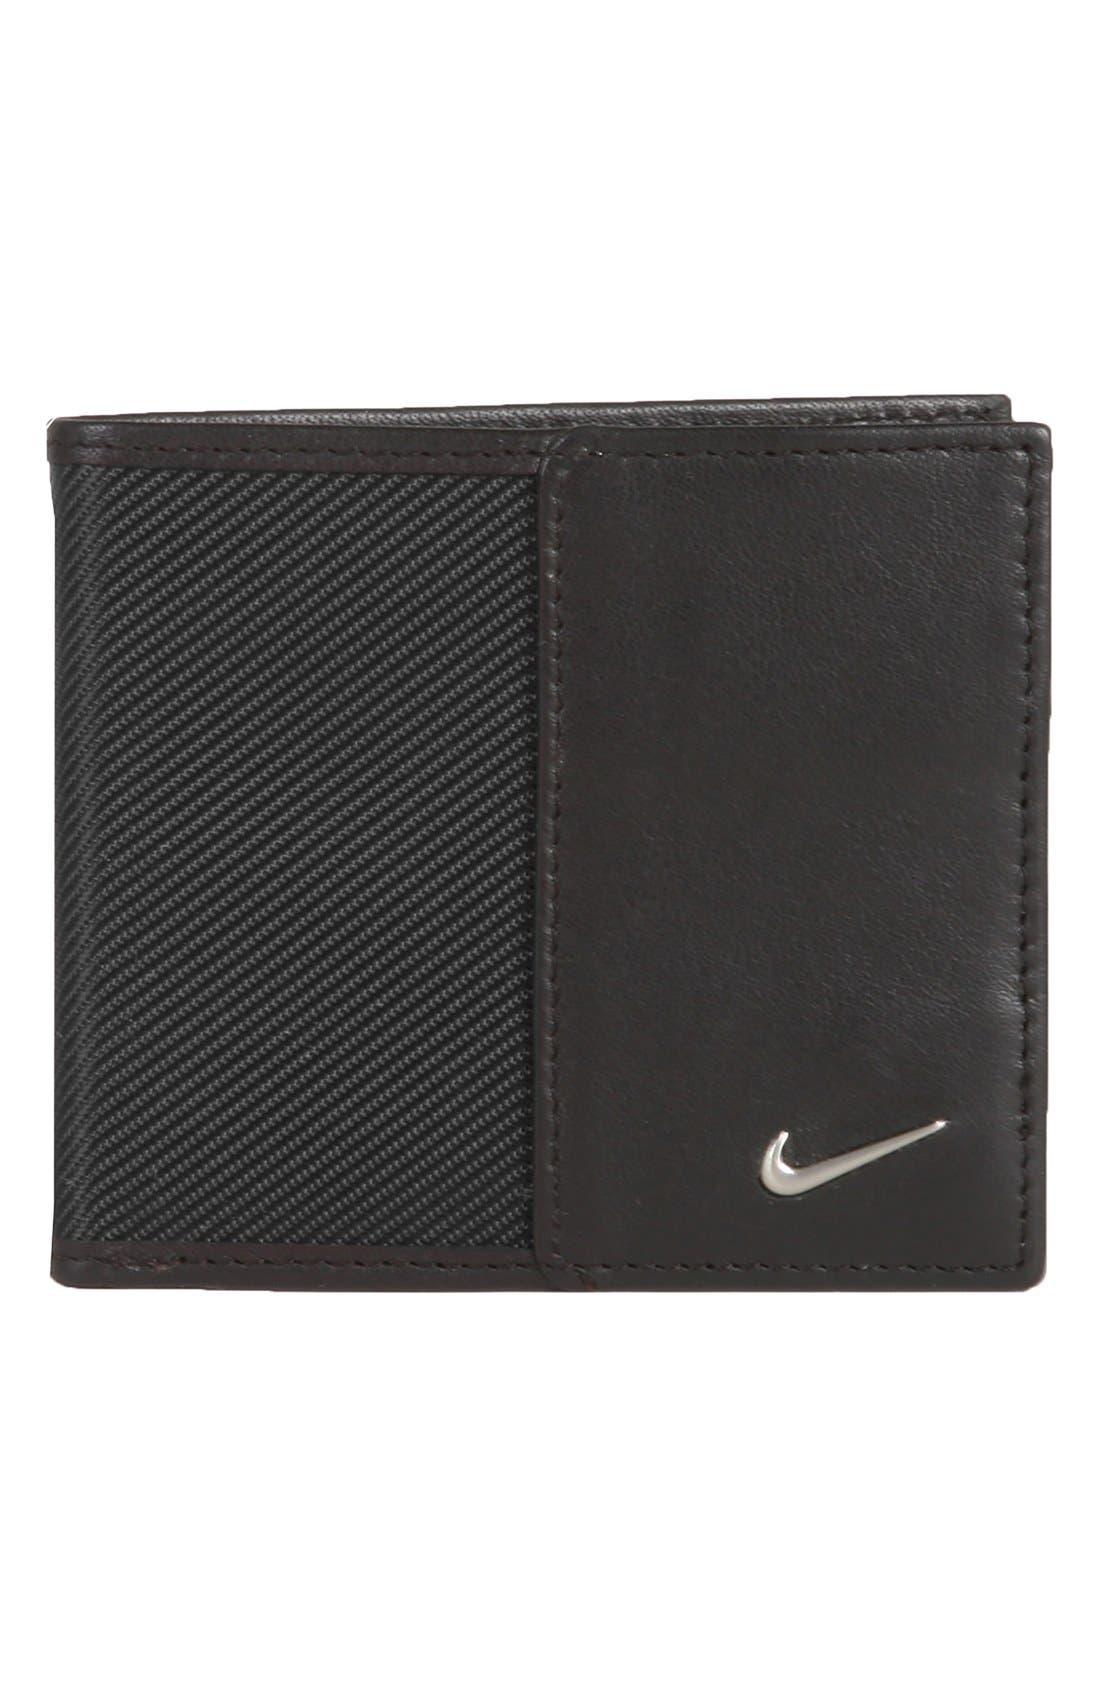 Leather Wallet,                             Main thumbnail 1, color,                             Black